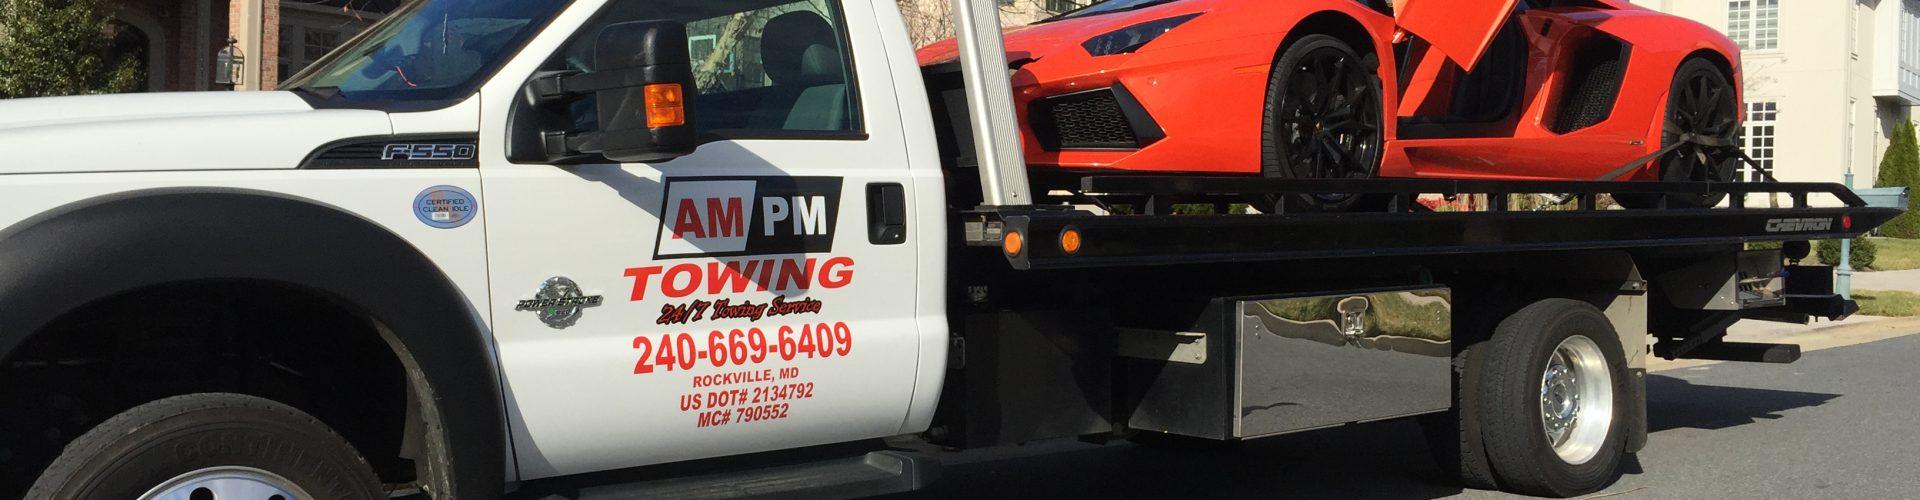 Auto Repair | Auto Body | Tow truck Rockville | roadside